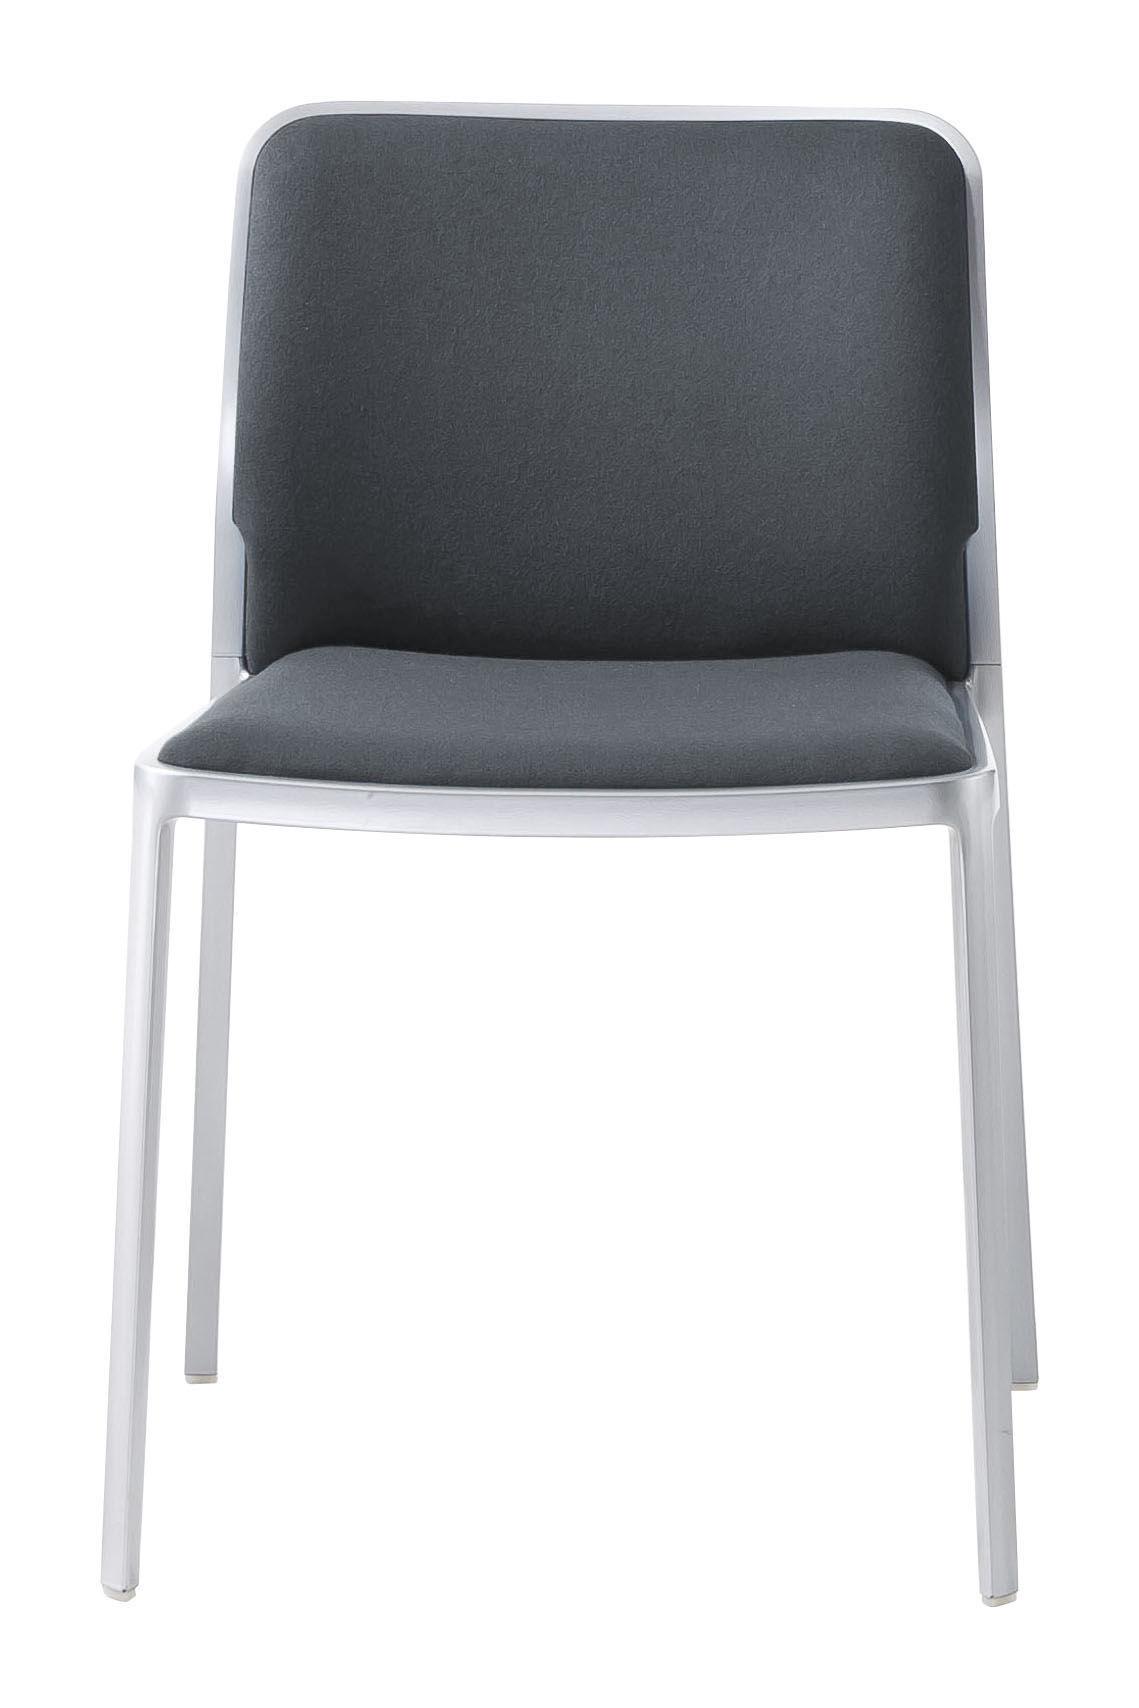 Möbel - Stühle  - Audrey Soft Gepolsterter Stuhl / Sitzfläche aus Stoff - Gestell Aluminium mattiert - Kartell - Gestell: Aluminium matt / Sitzfläche: Stoff grau - Gewebe, klarlackbeschichtetes Aluminium